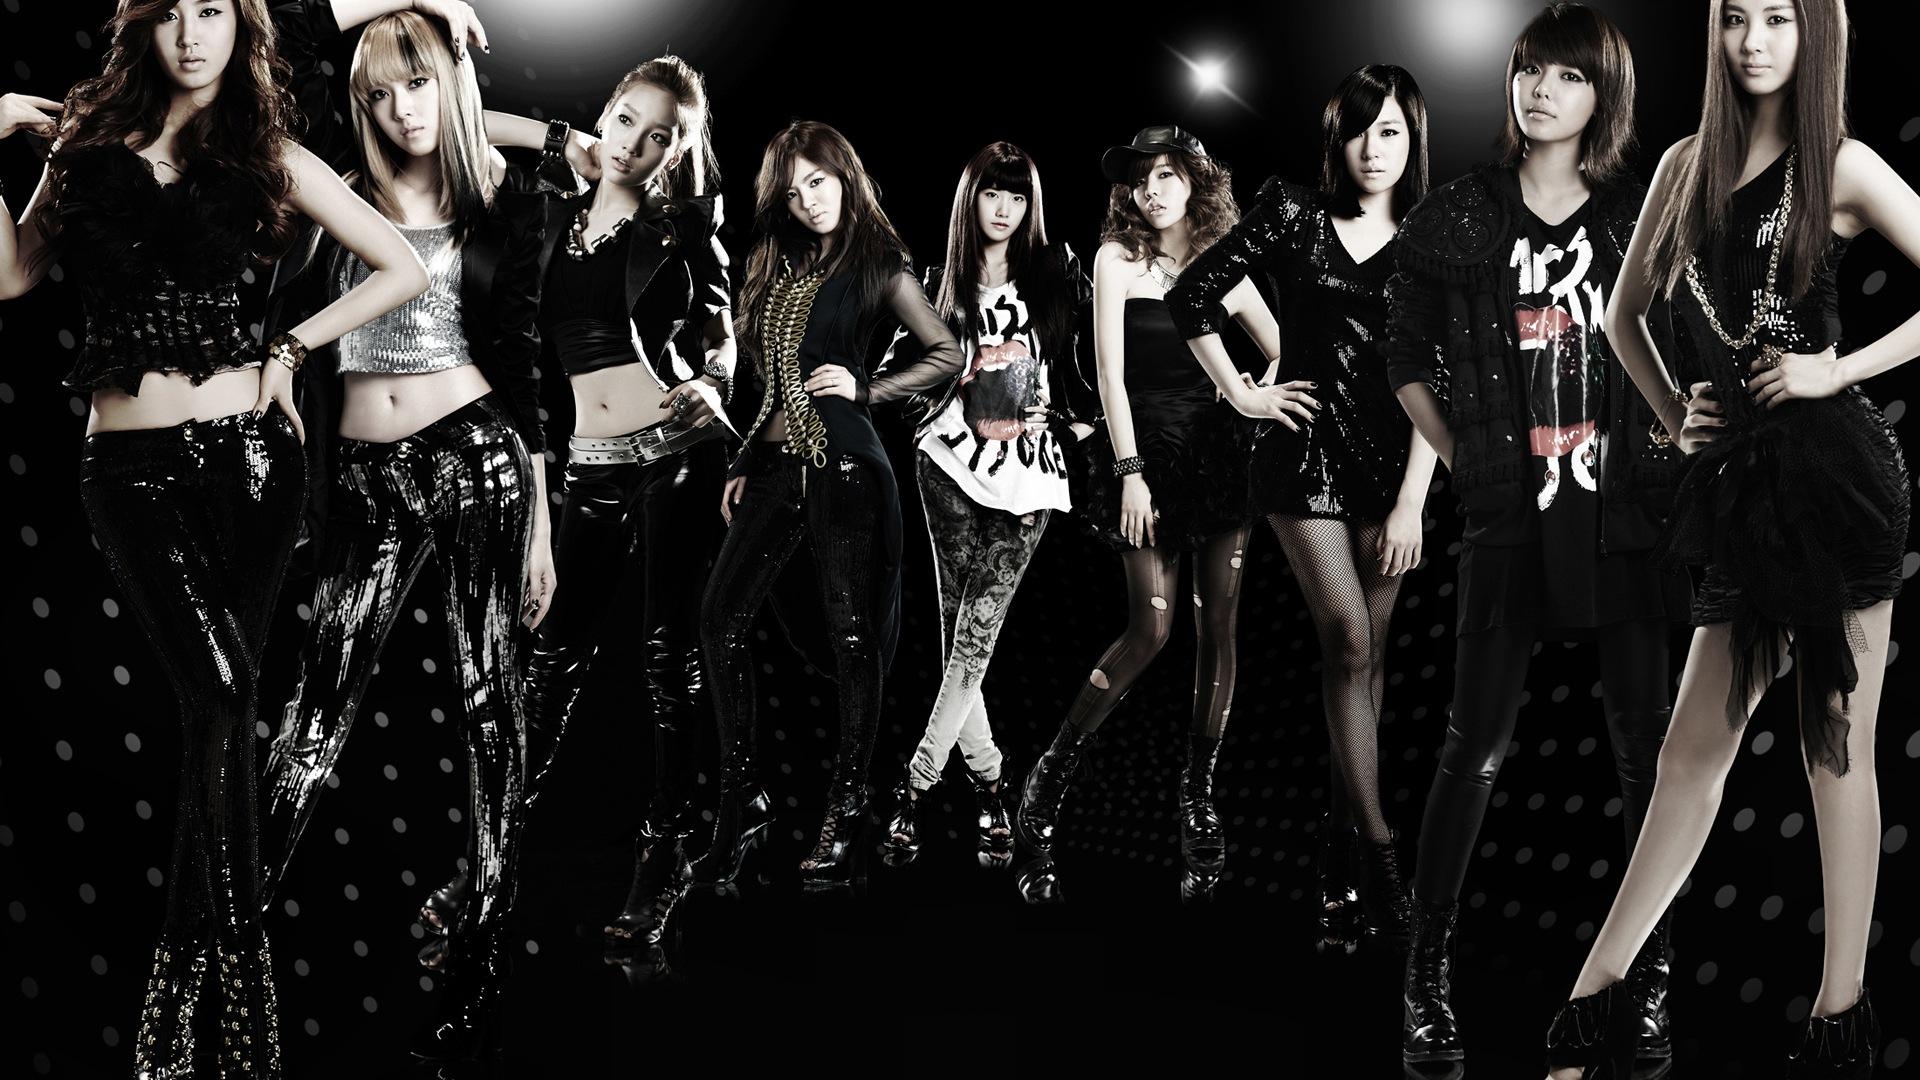 Korean Girl group Nine Muses HD Wallpapers #2 - 1920x1080